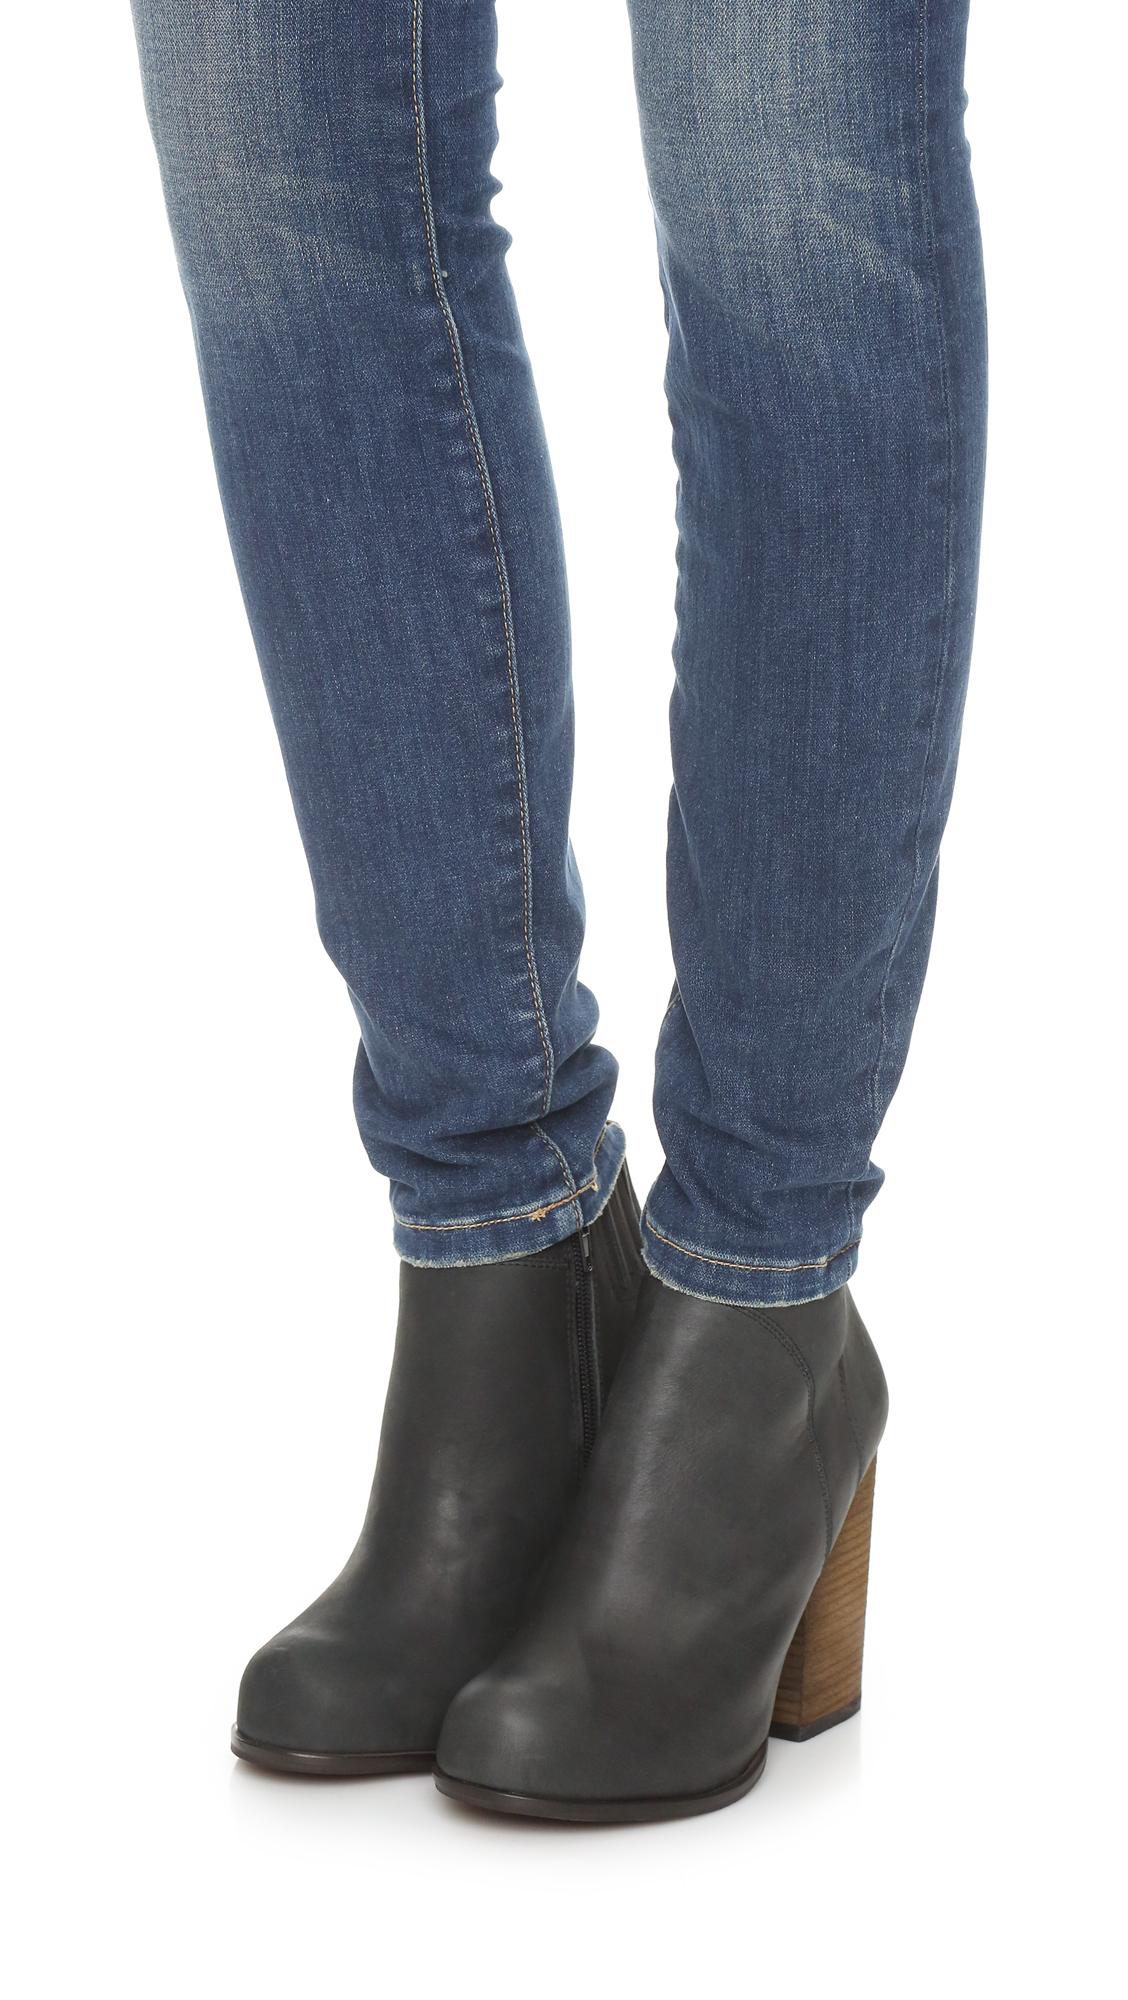 78ebda61e218 Jeffrey Campbell Hanger Leather Booties